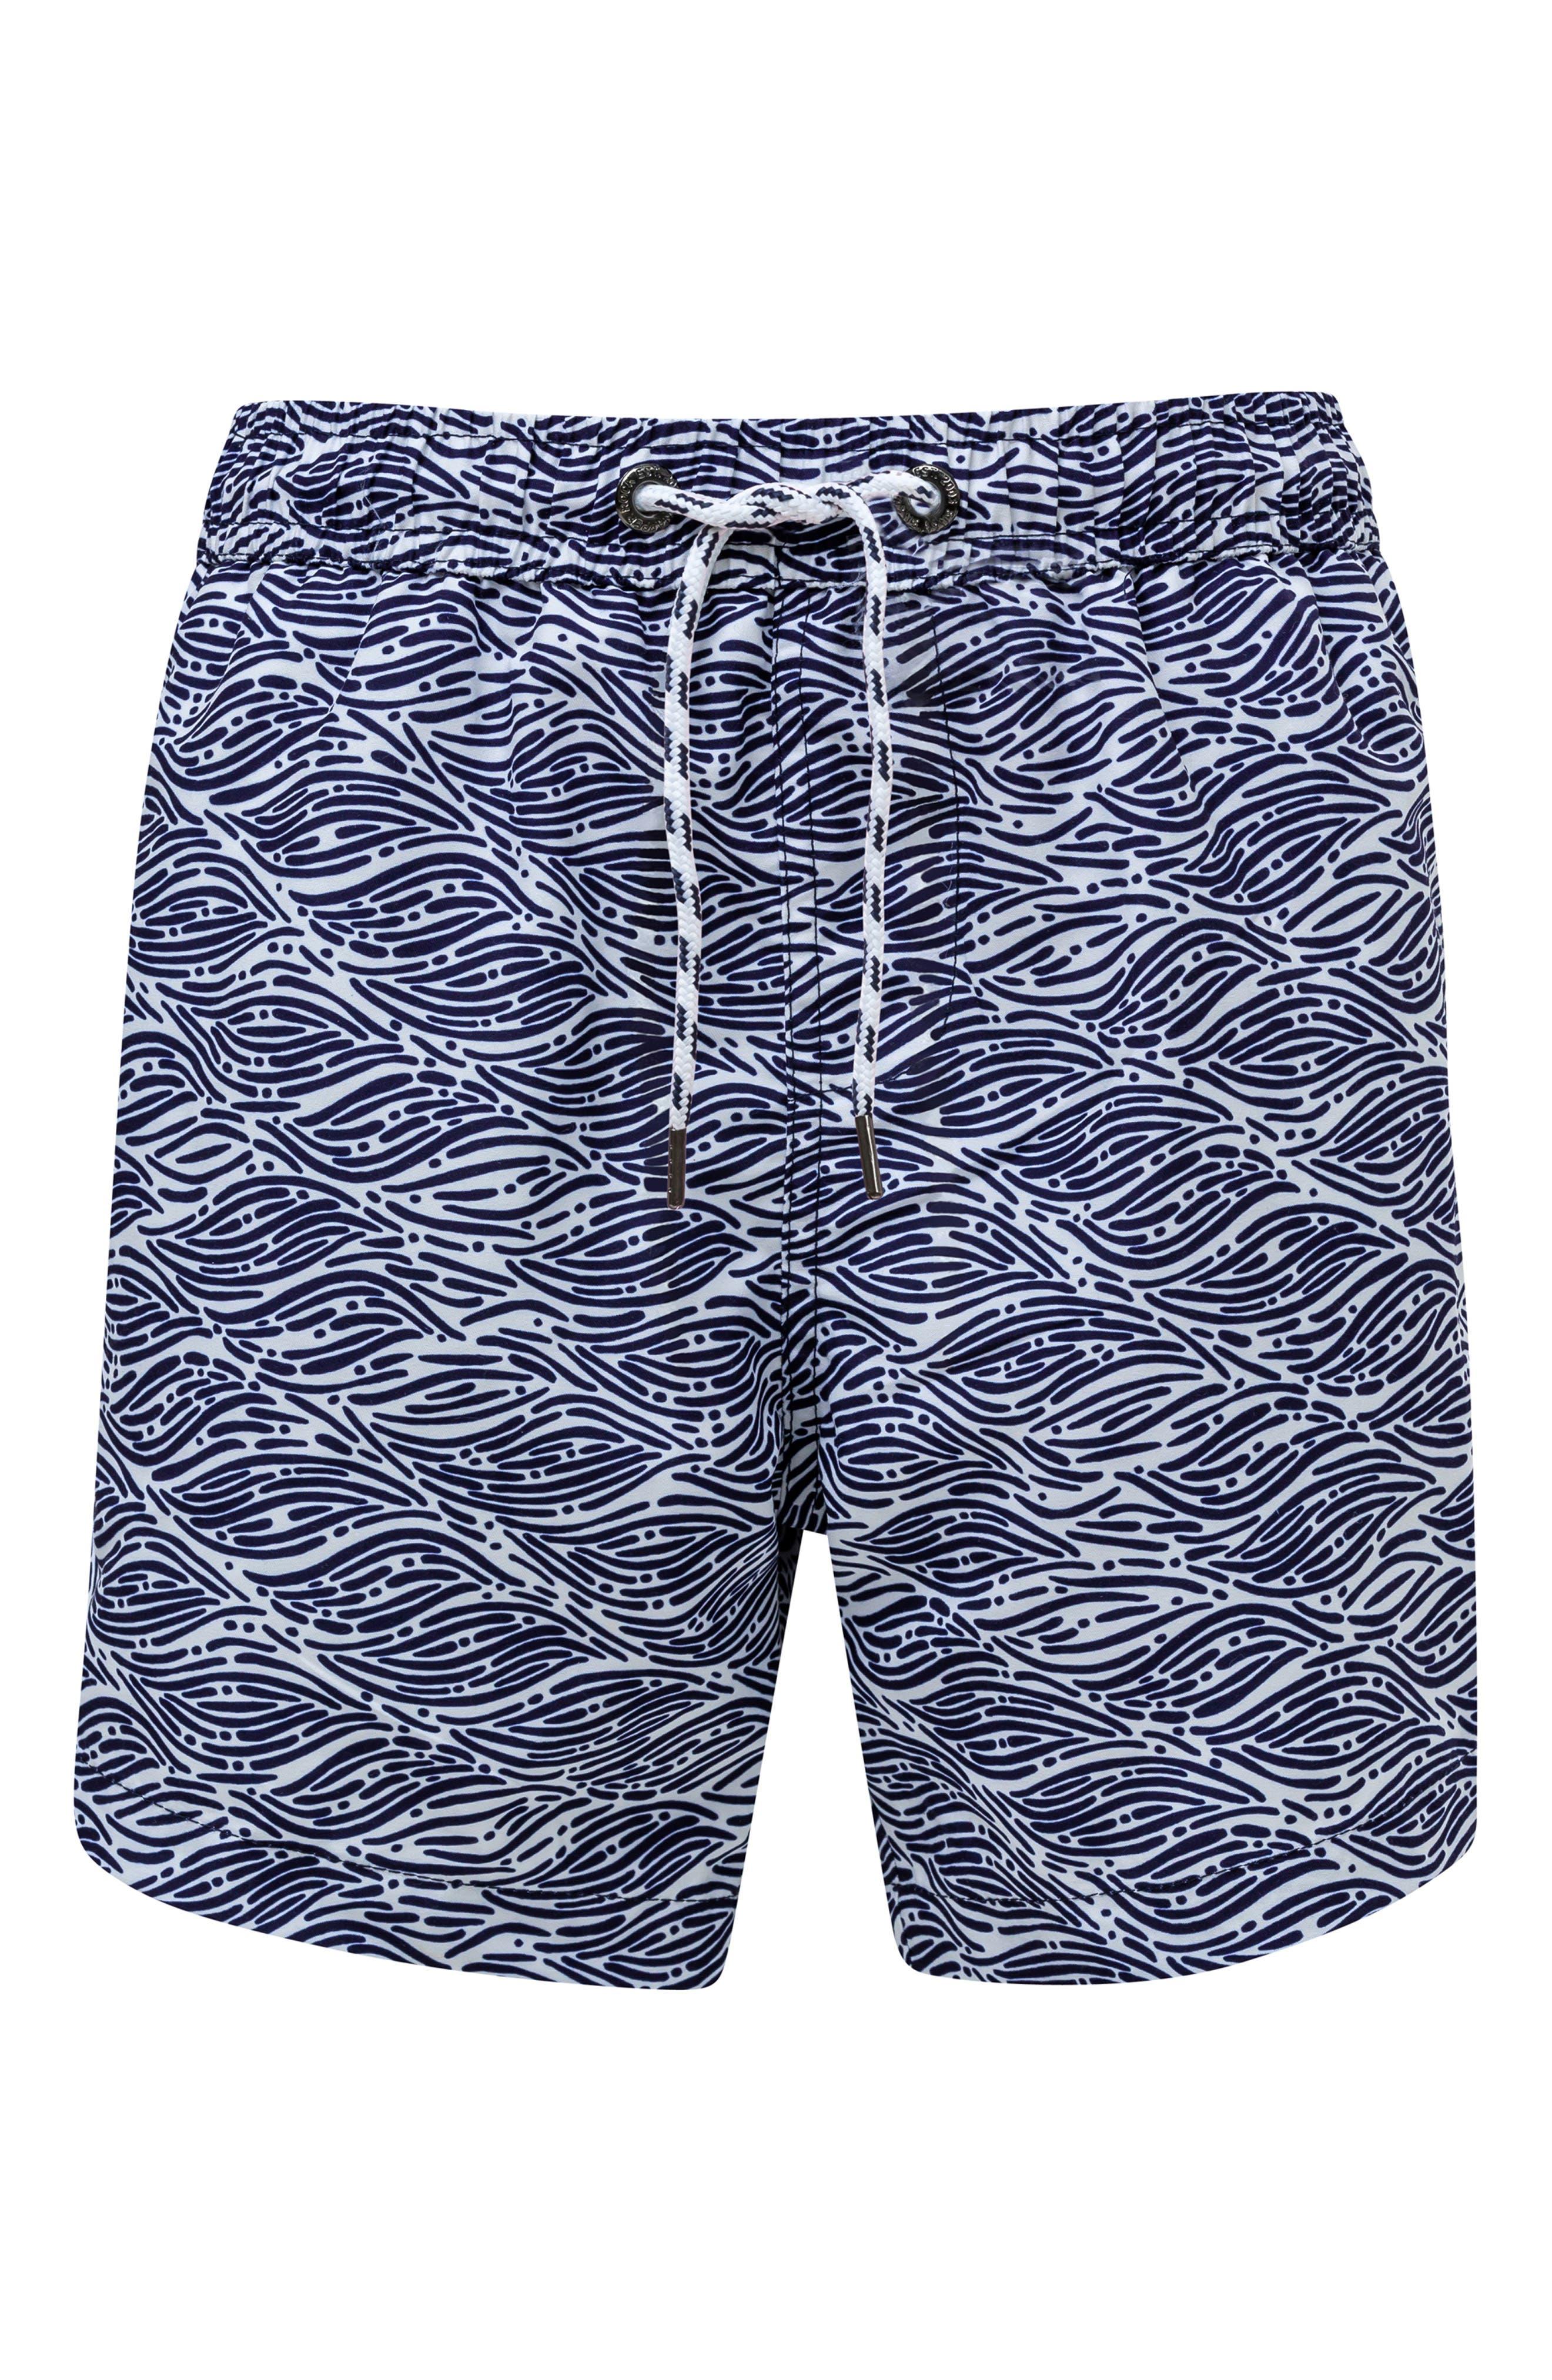 High Tide Board Shorts,                         Main,                         color, NAVY